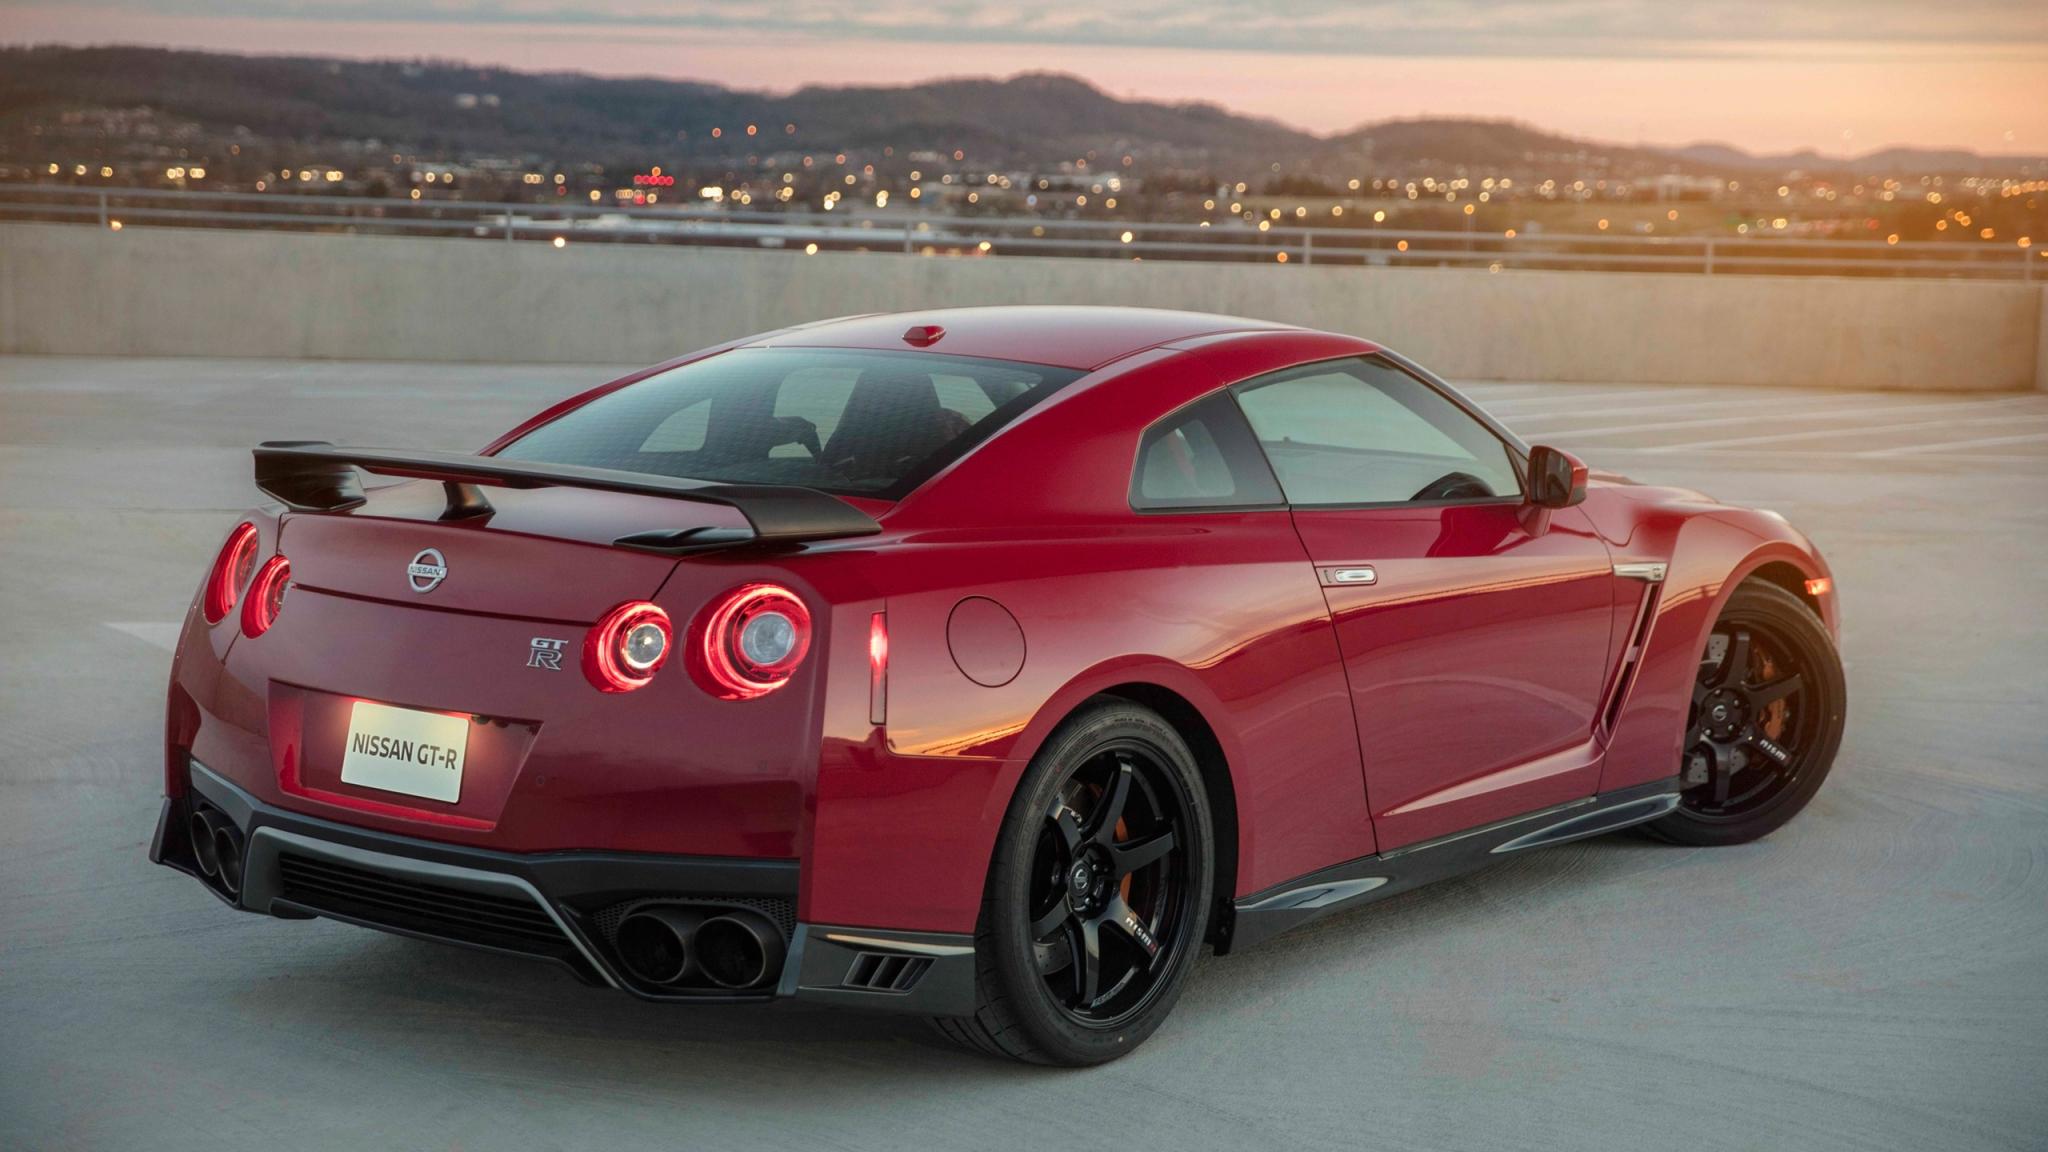 2048x1152 wallpaper Nissan GT-R, rear view, red car